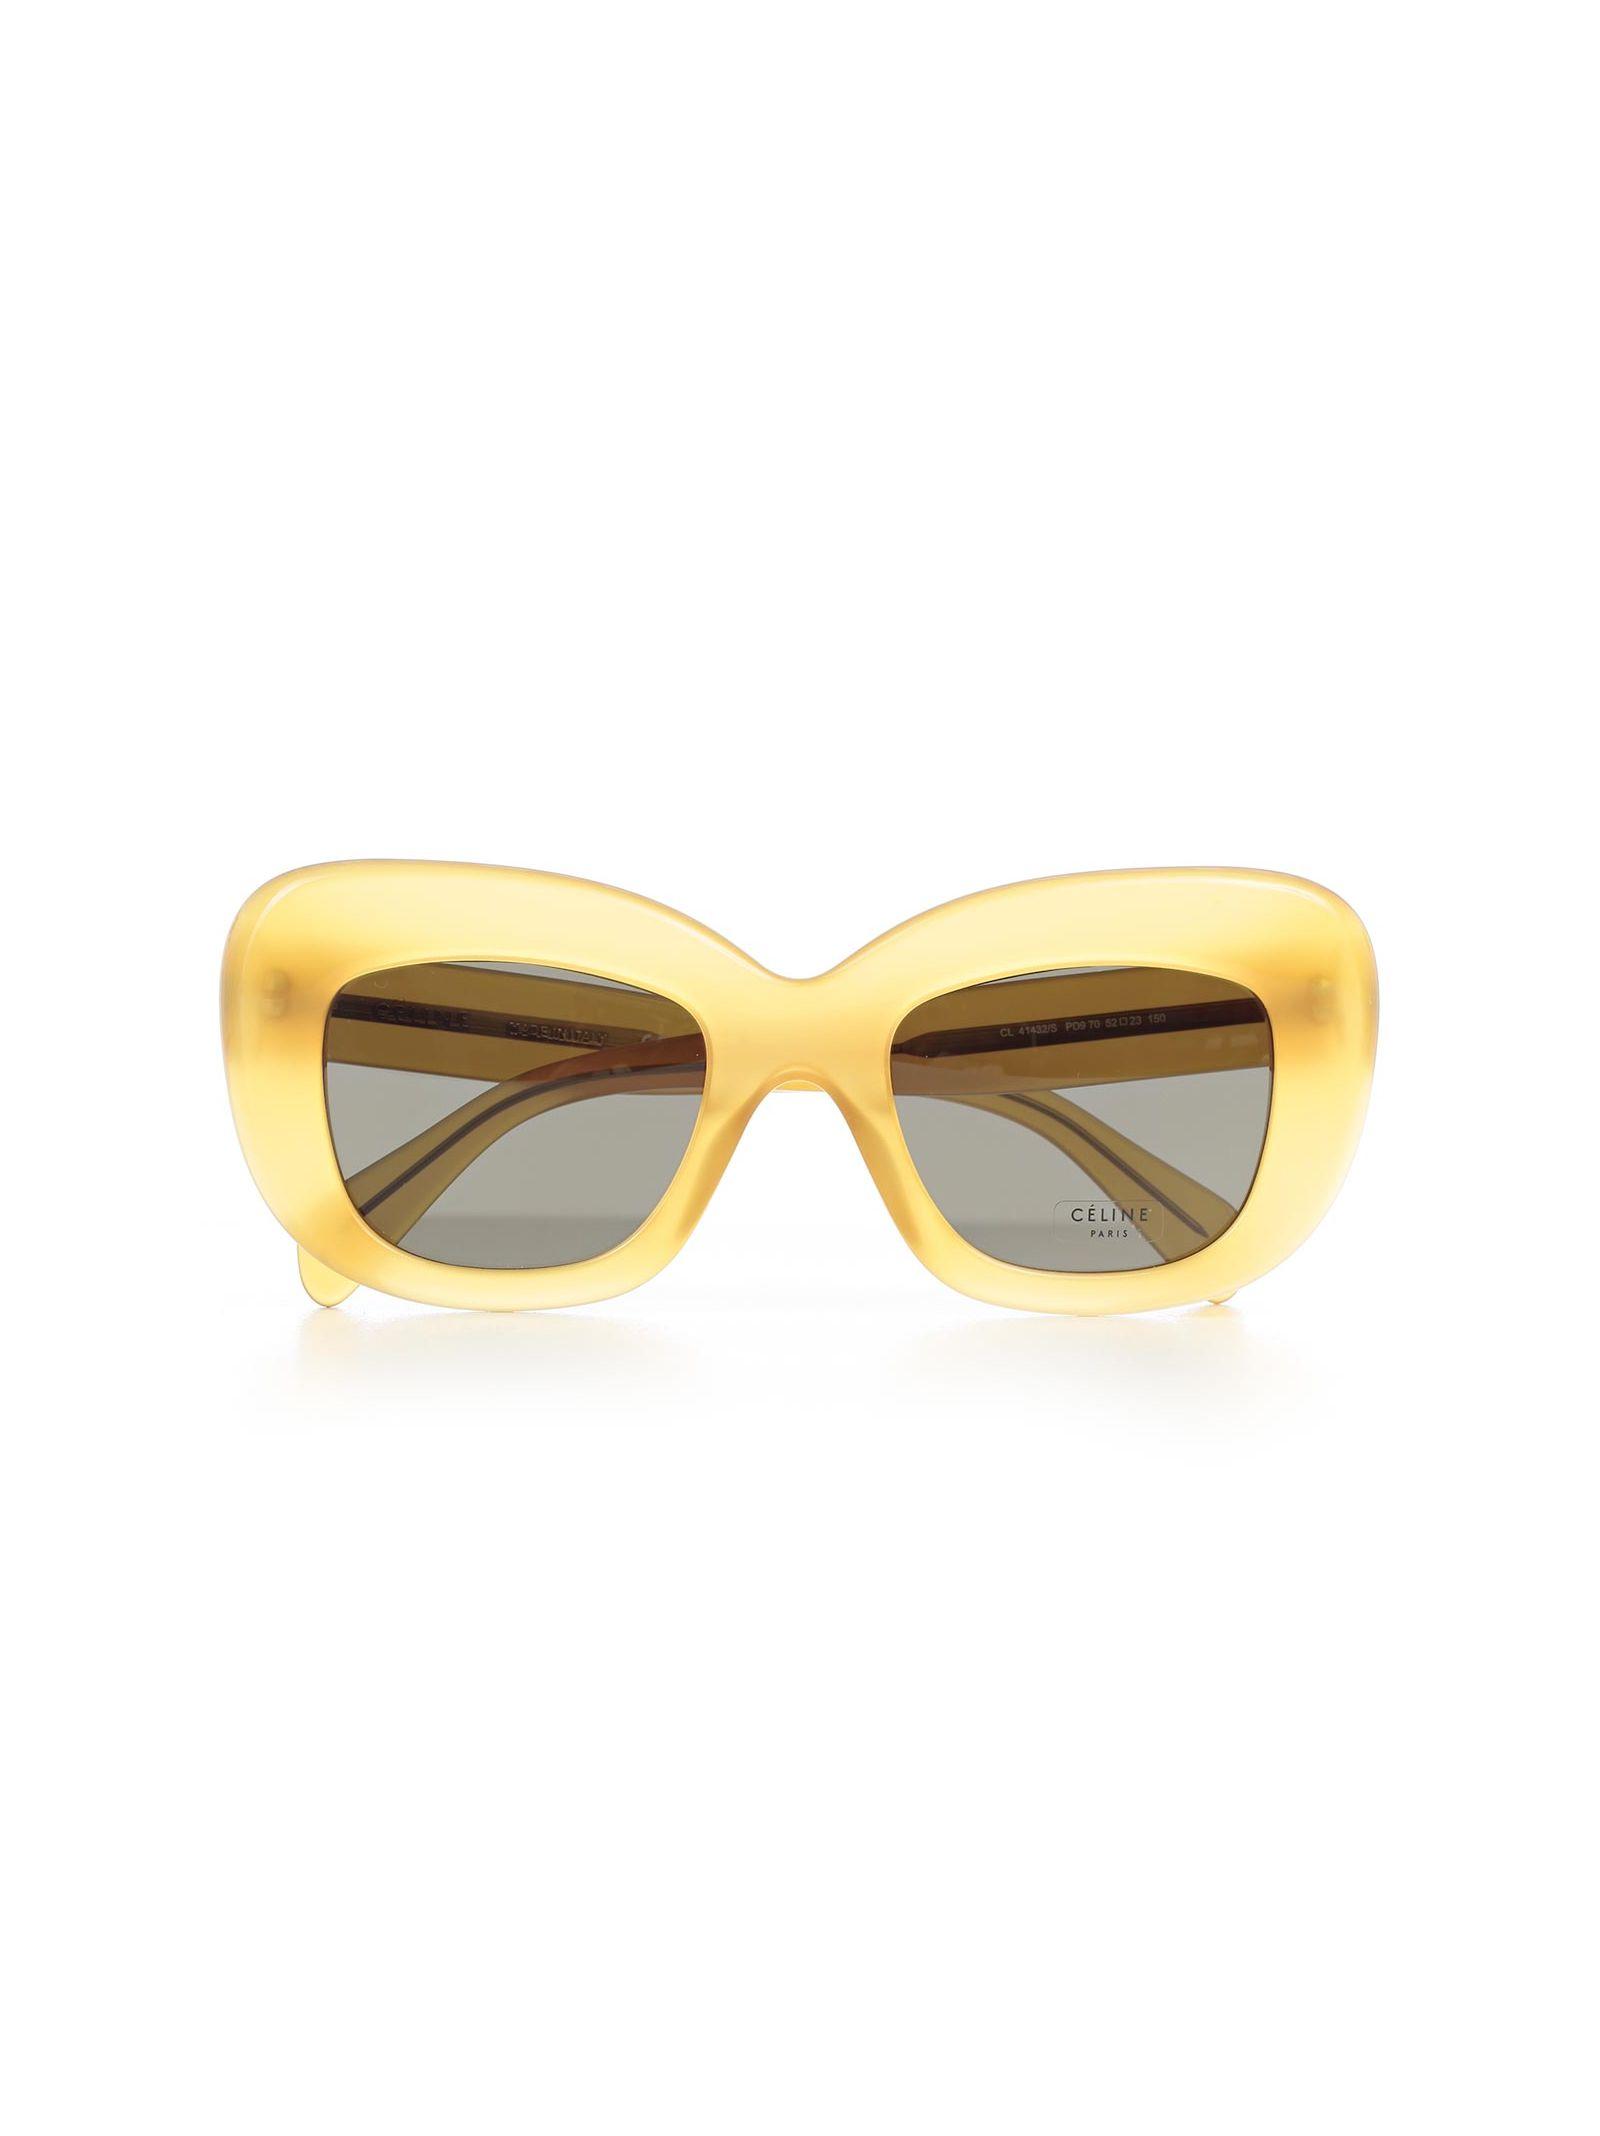 Celine Eyewear - Celine - Bread